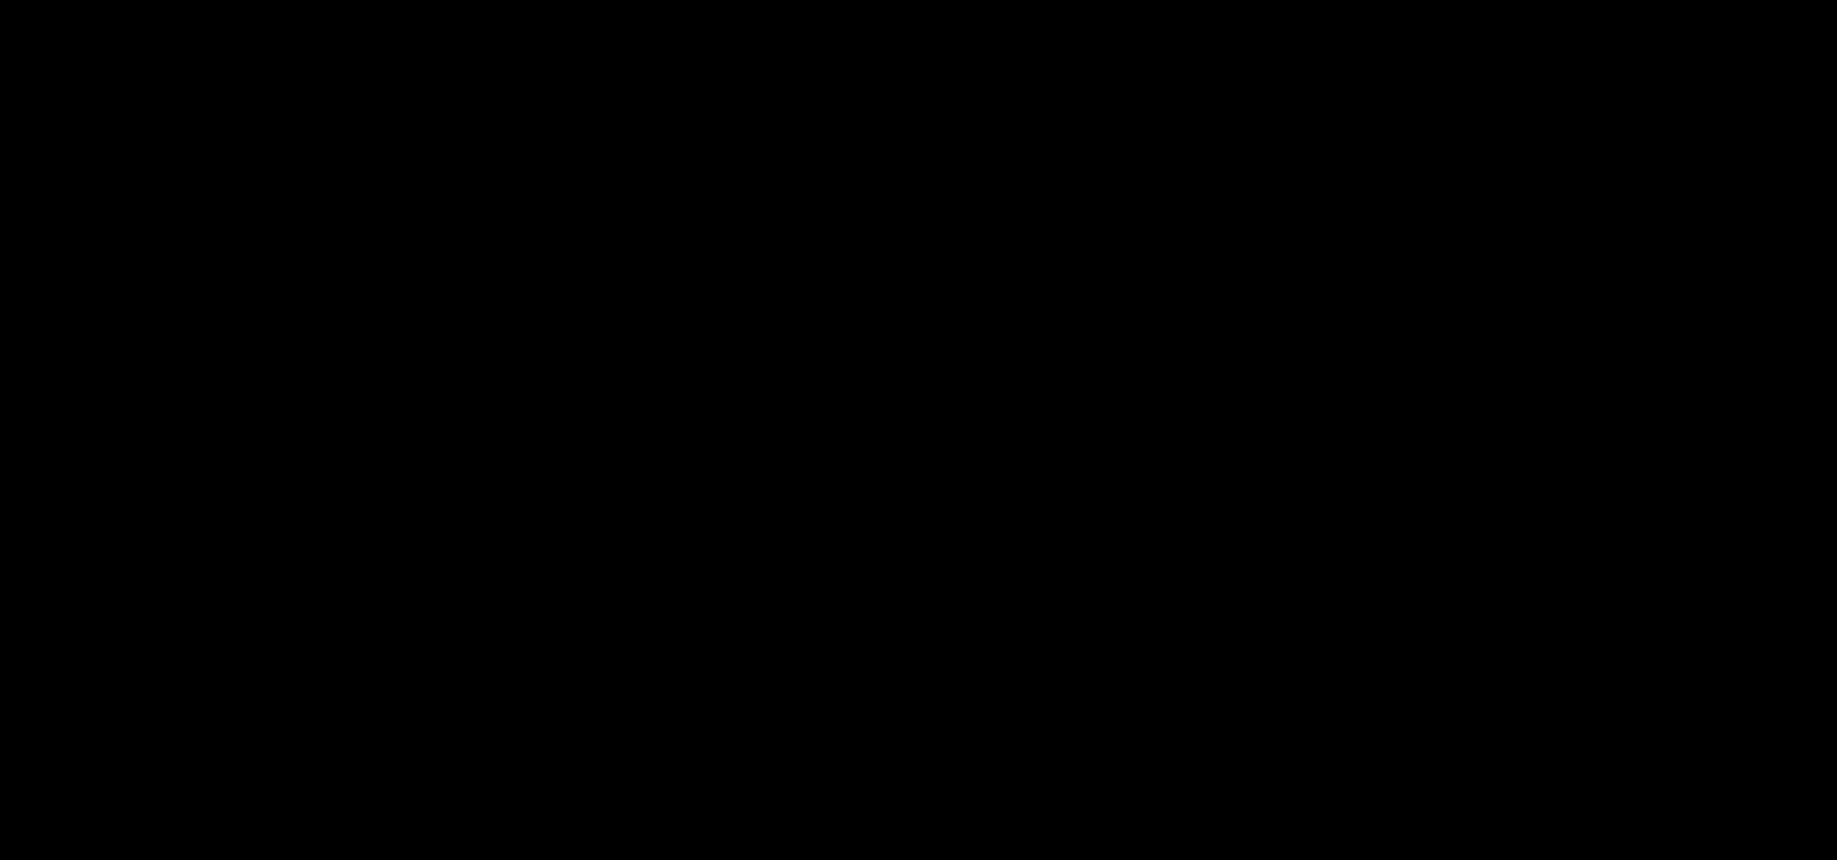 cl-4-30-18